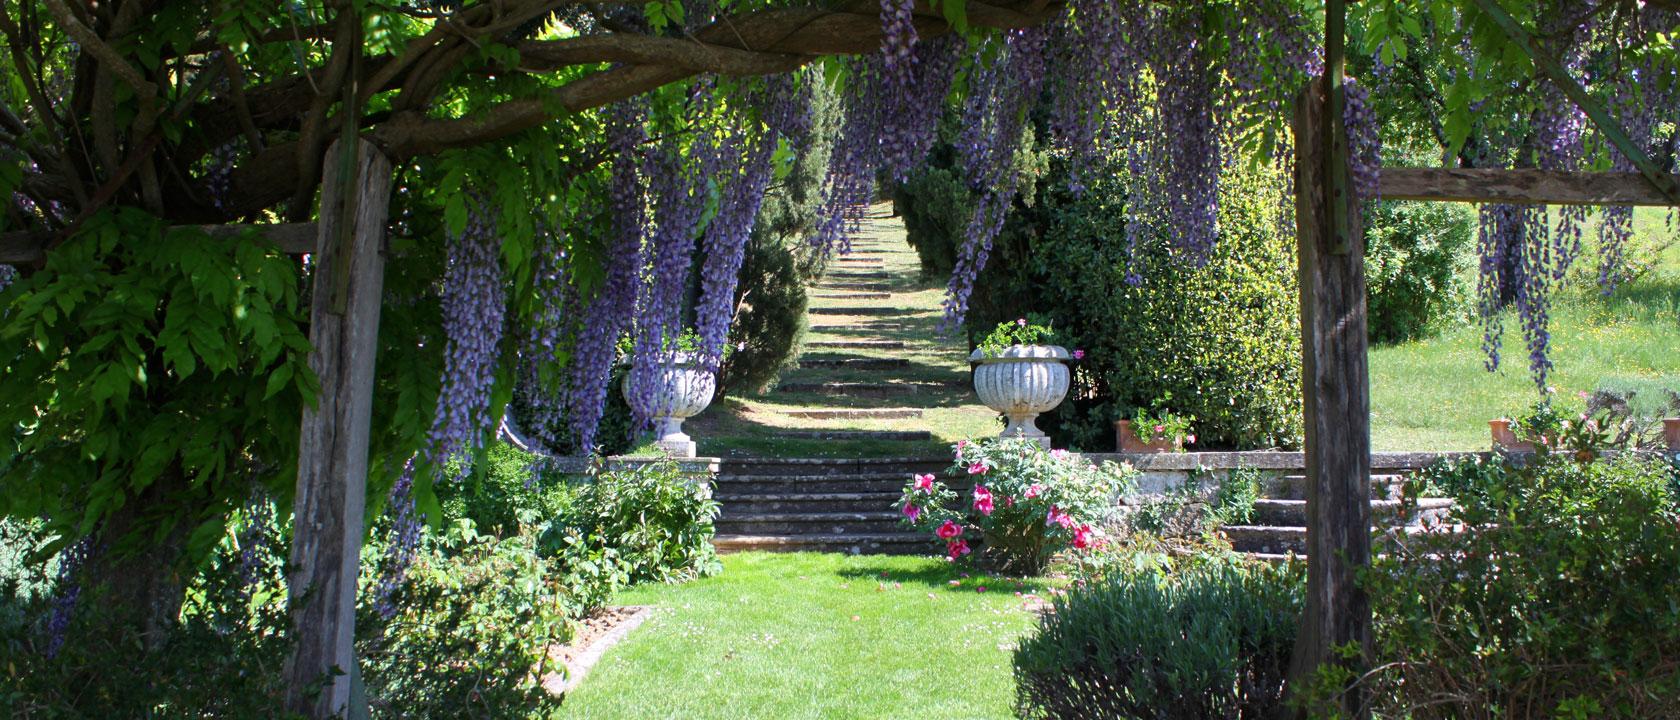 Villa-La-Foce-Chianciano-Terme-Italy-David-Henderson.jpg